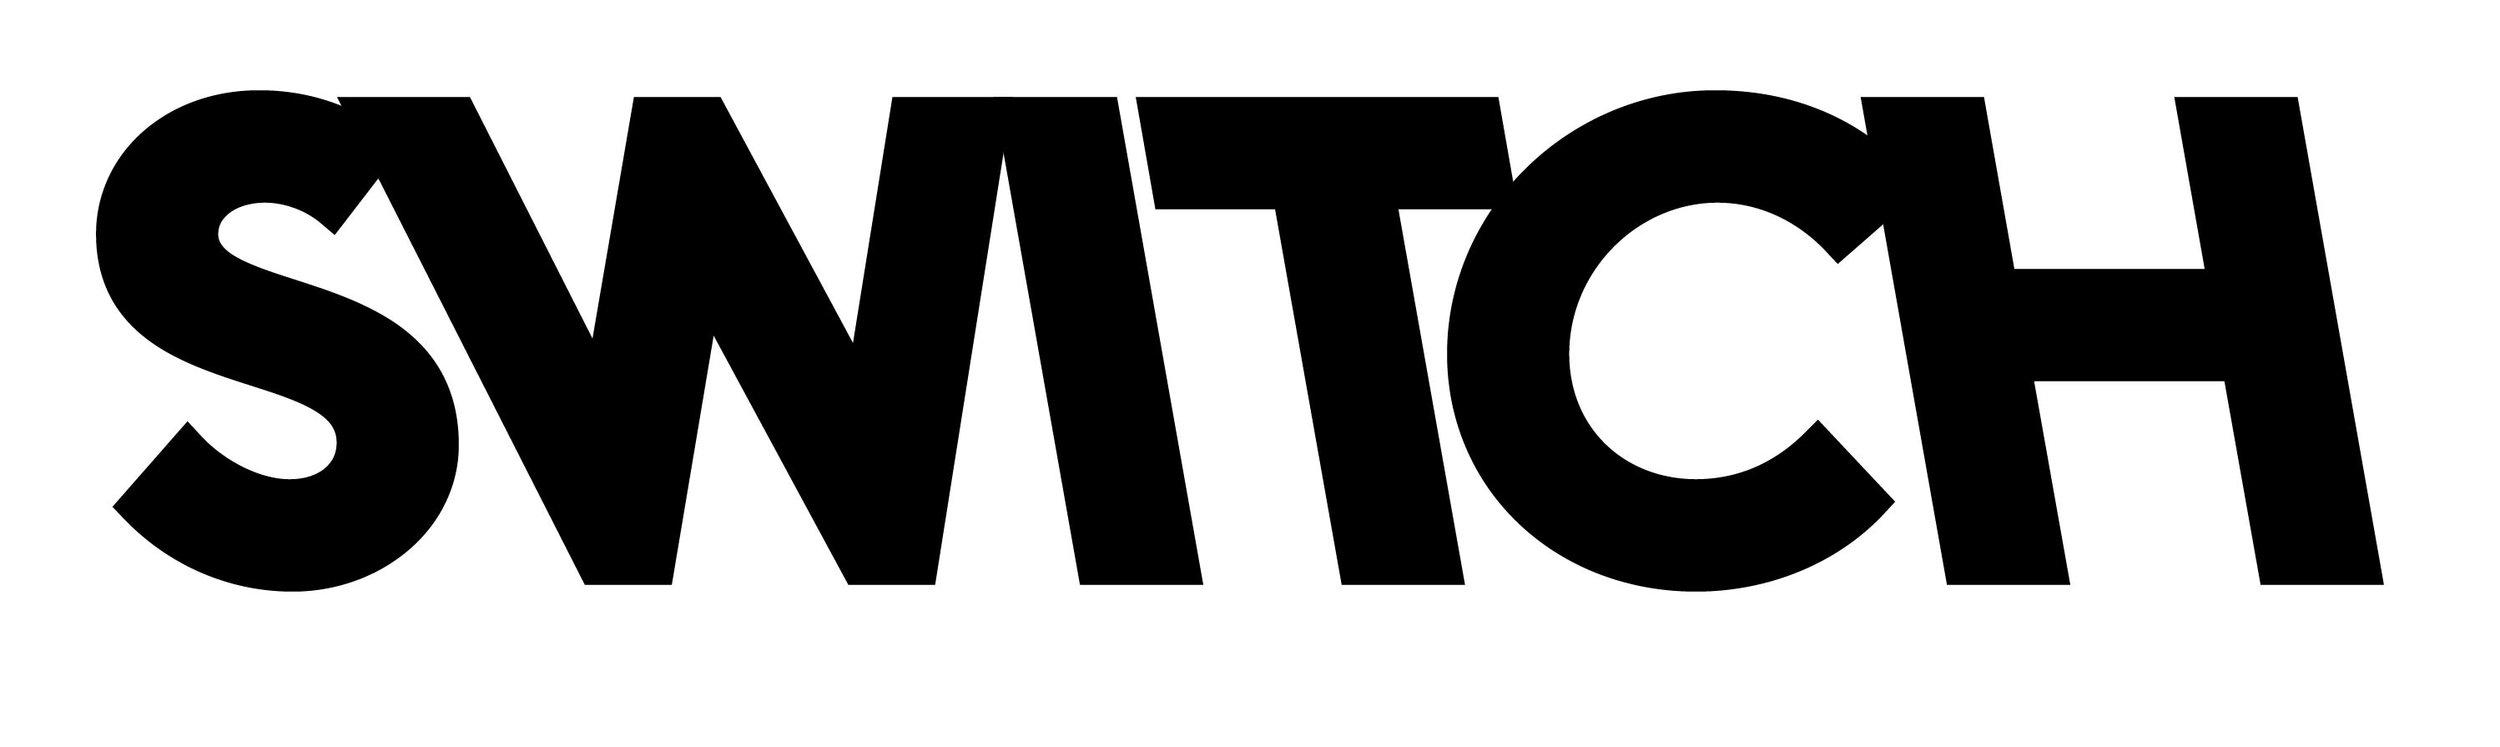 switch1.jpg